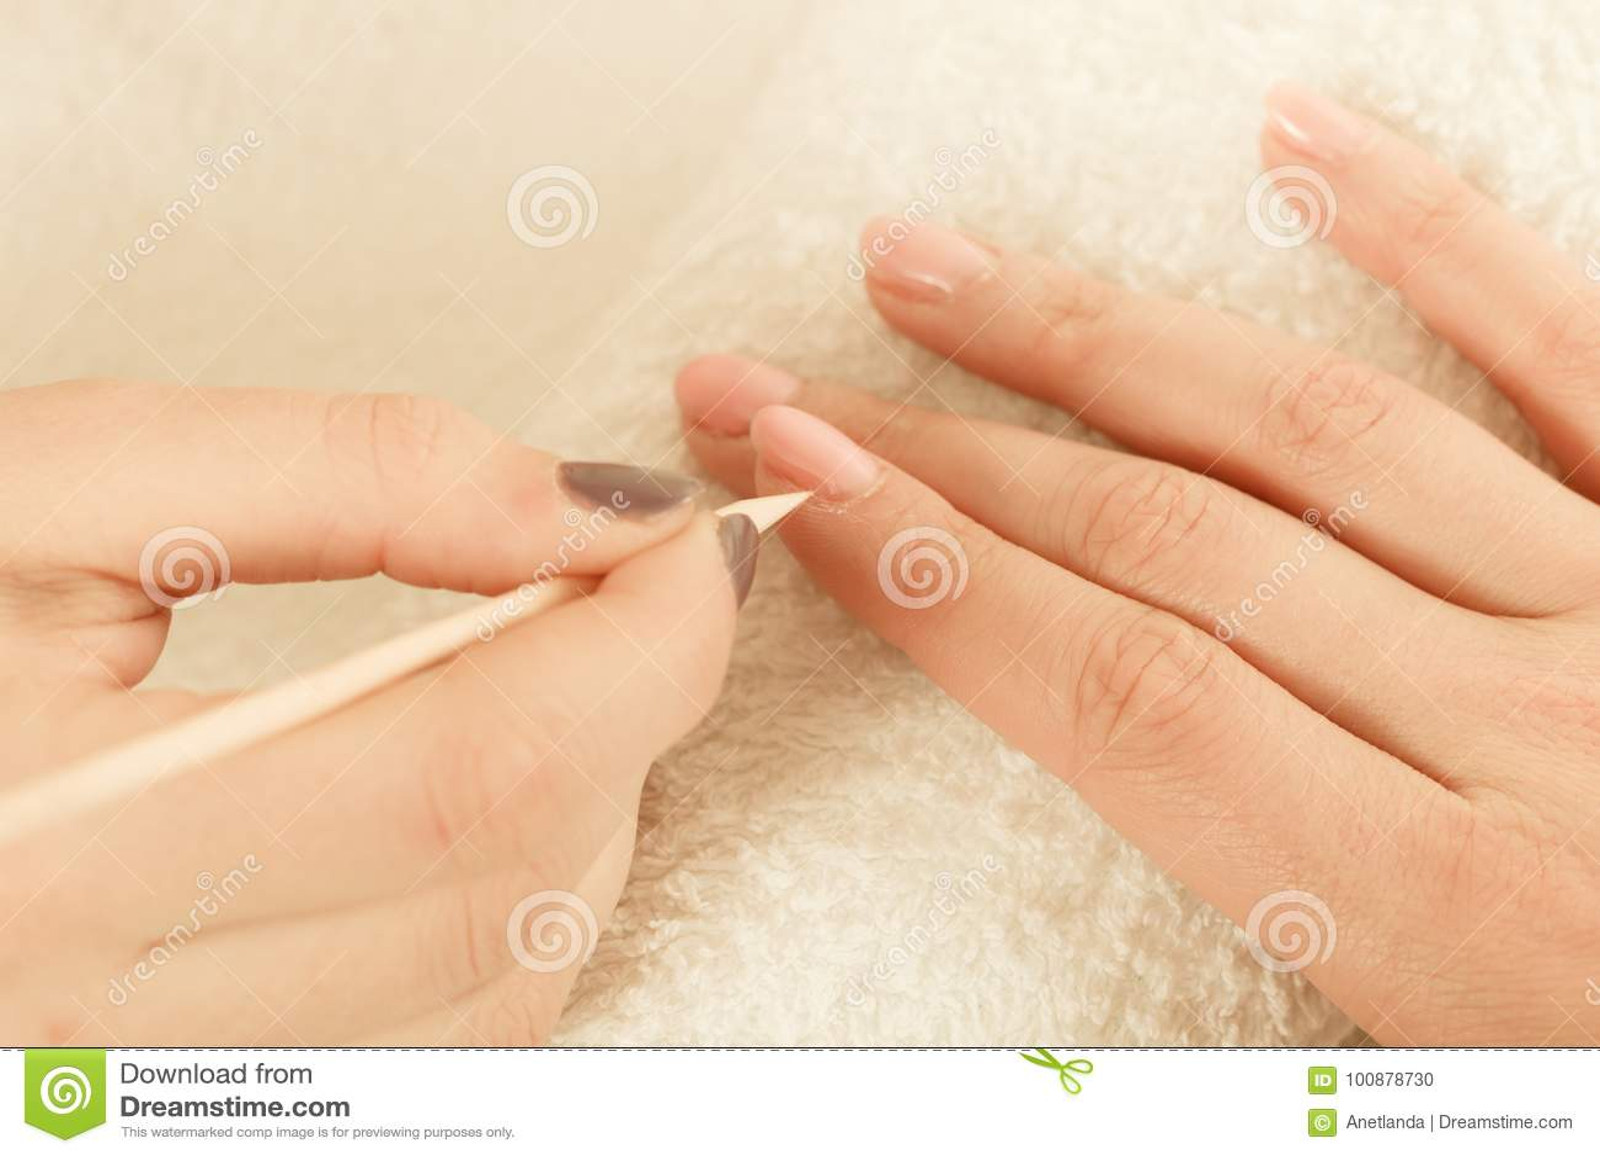 Beautician Preparing Nails Before Manicure, Pushing Back Cuticles ...